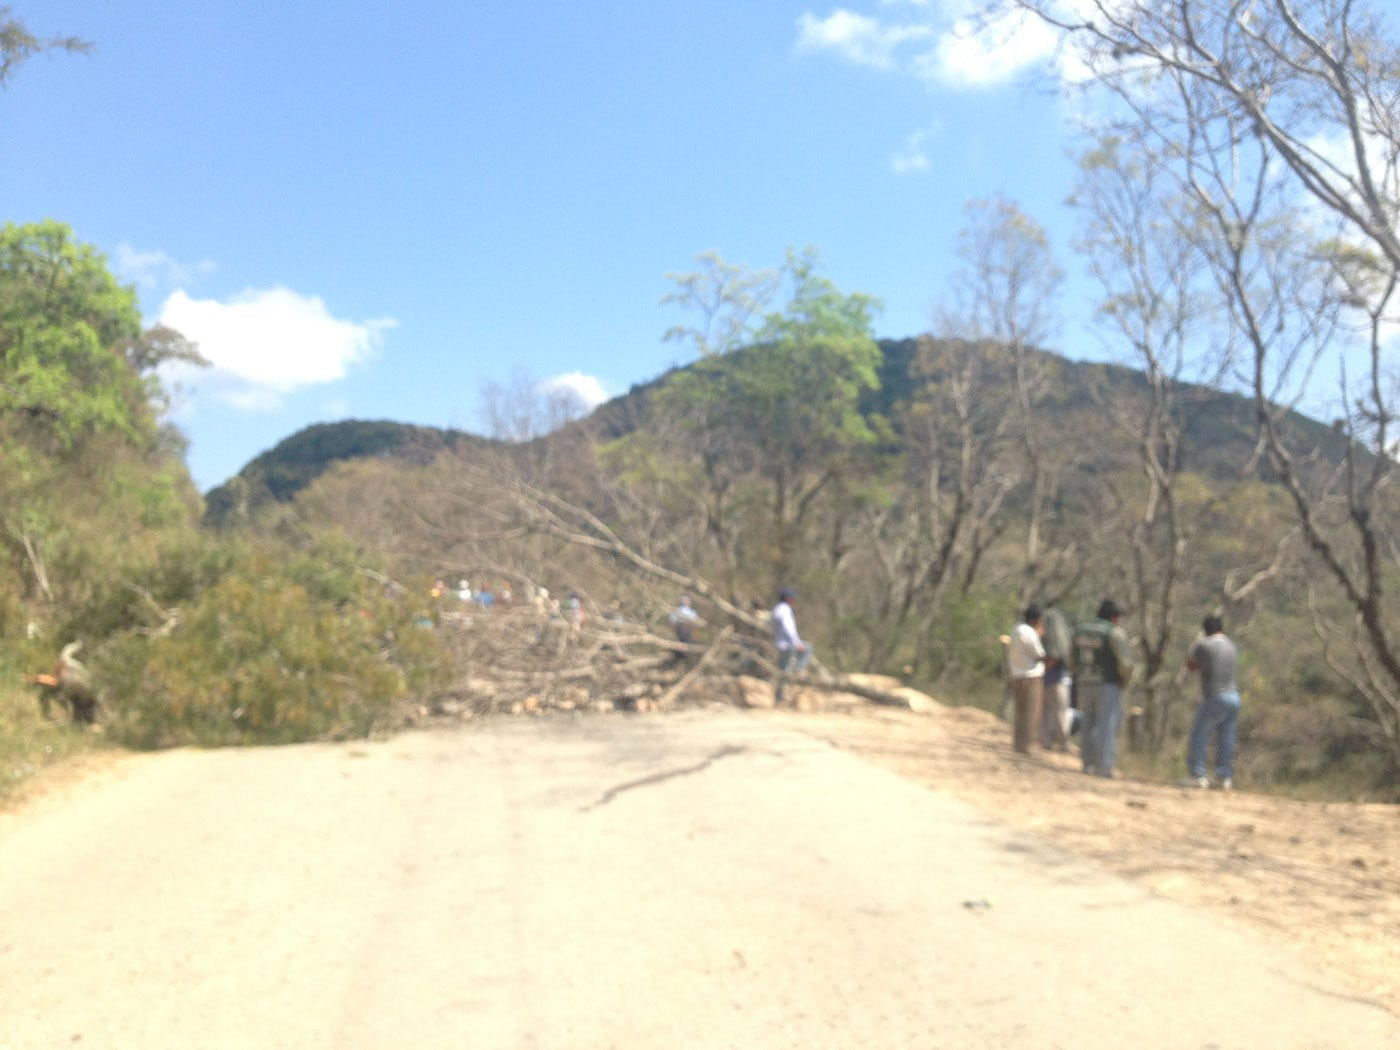 Road block in Samaipata, Bolivia